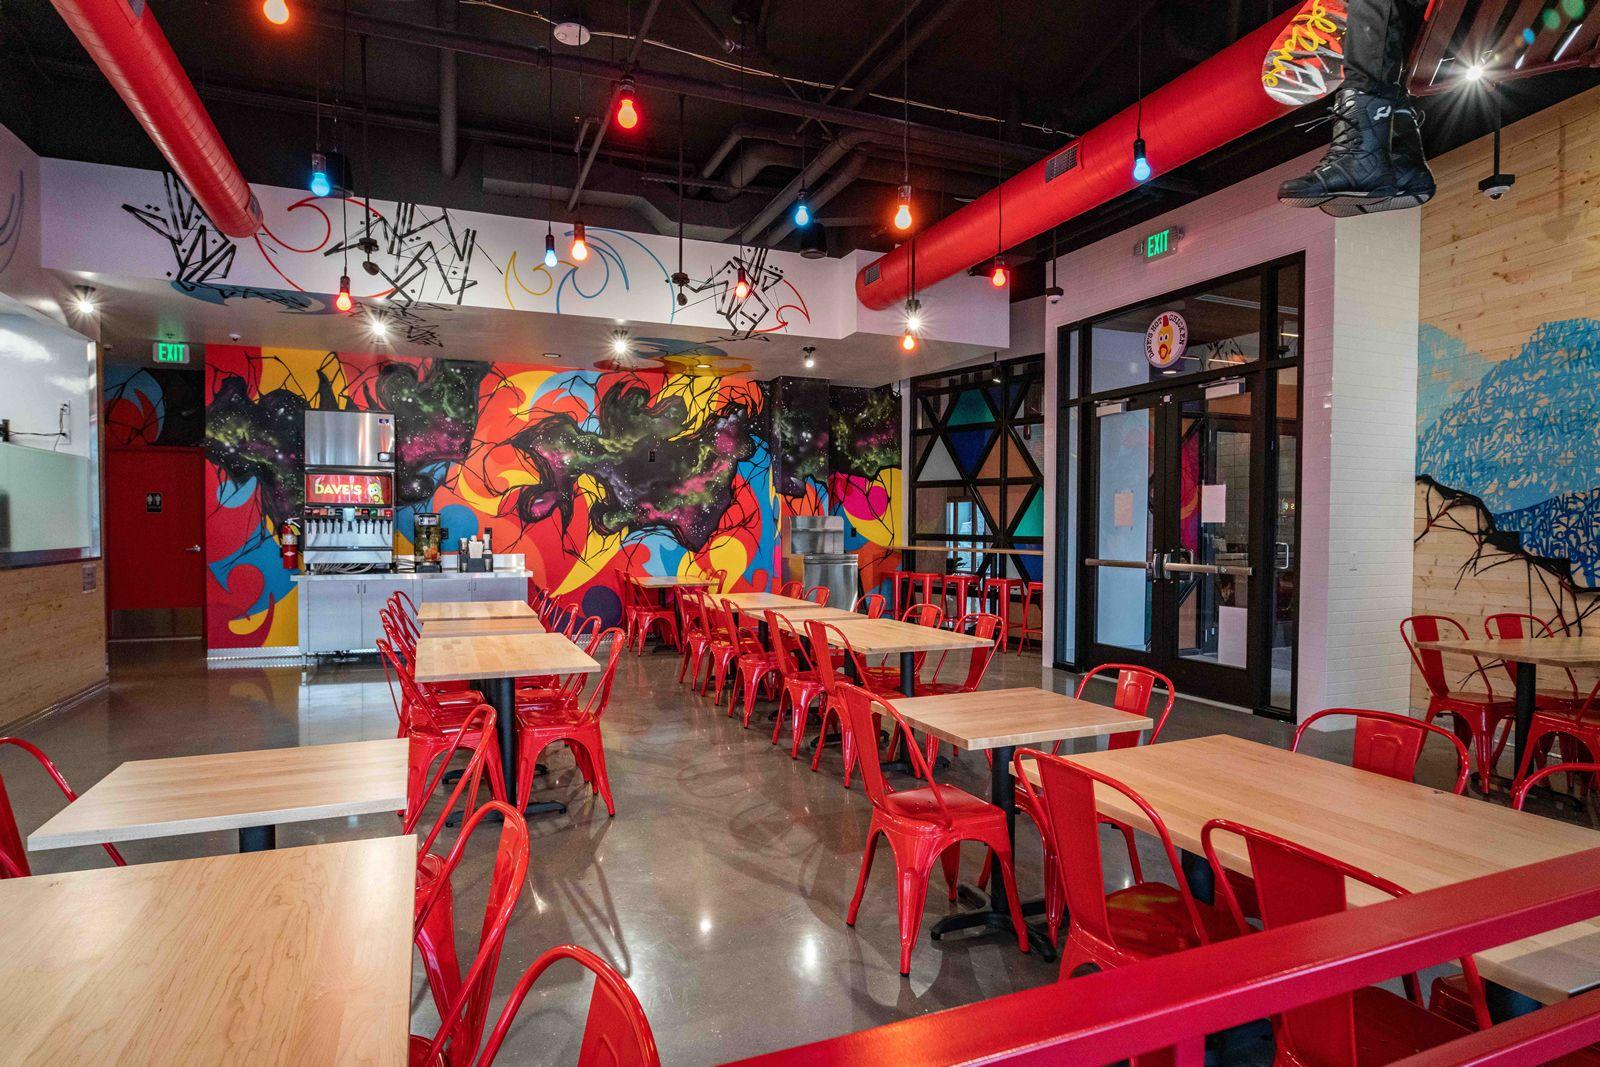 Dave's Hot Chicken Opens First Location in Denver